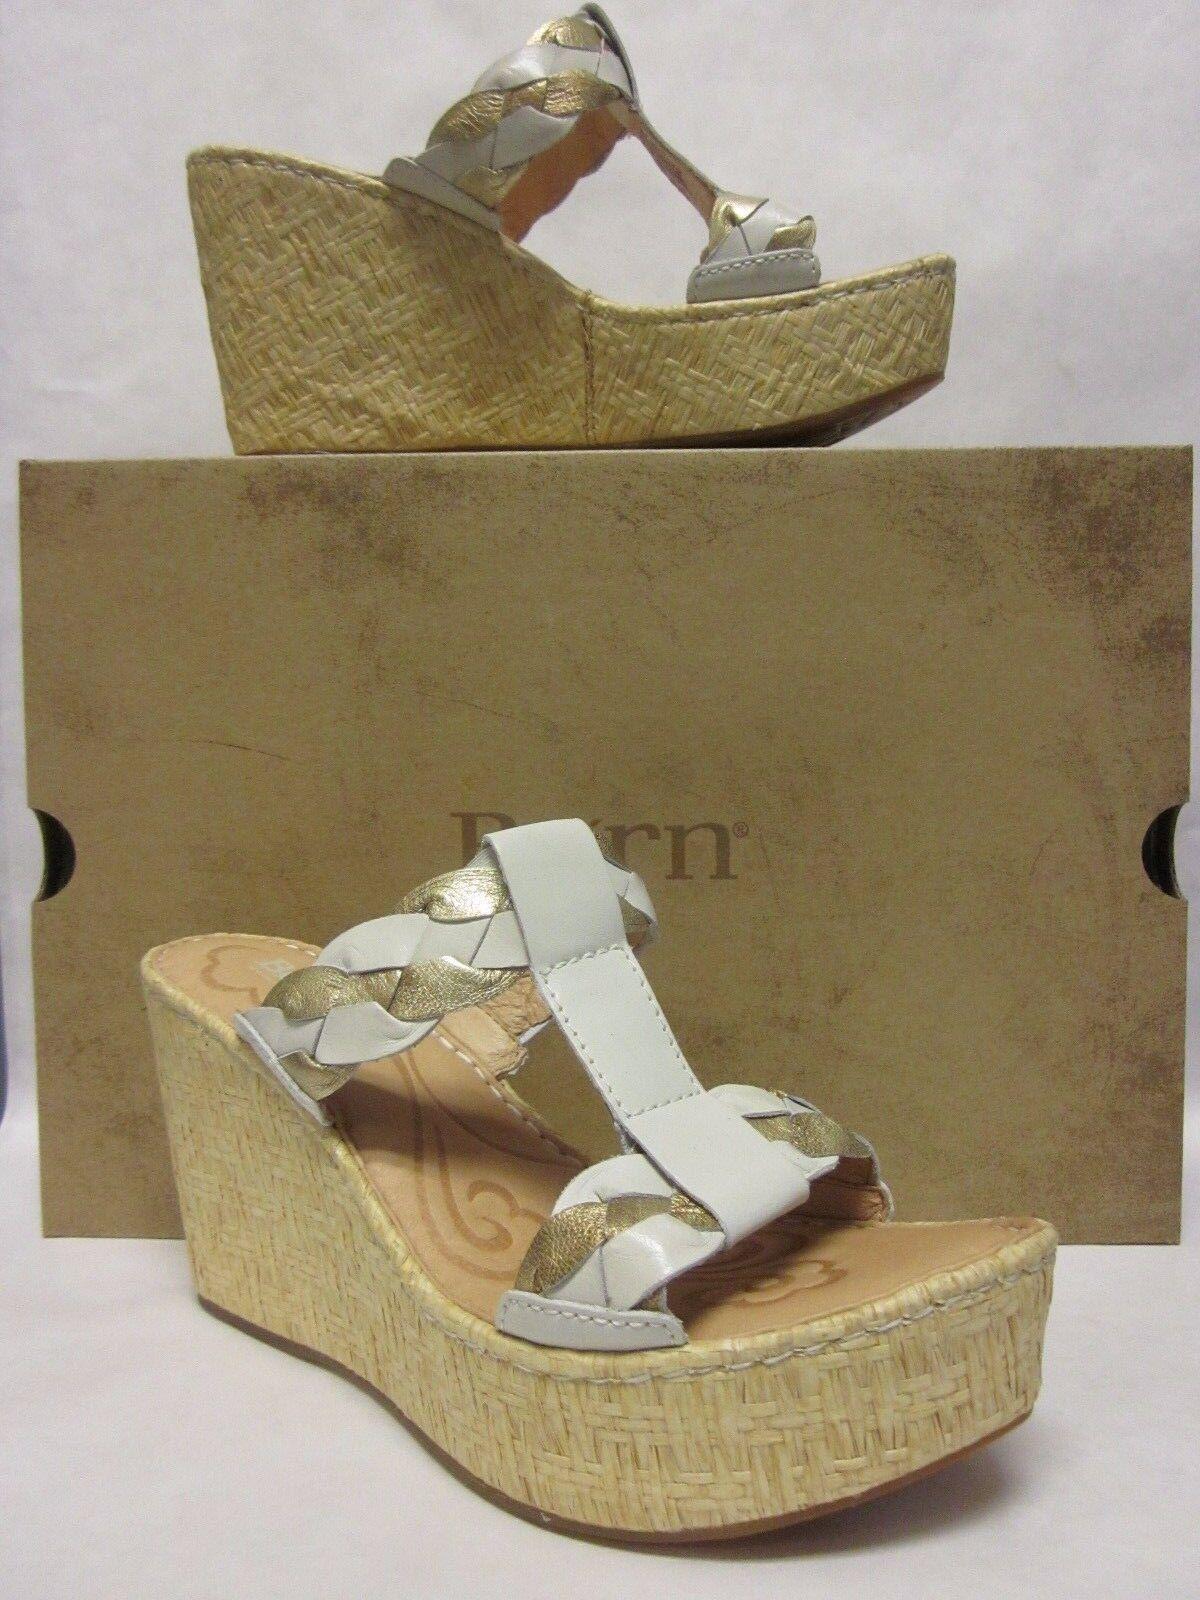 Nato Barstow Off bianca oro Wedge Platform Sandal  -Dimensione 8  vendita economica